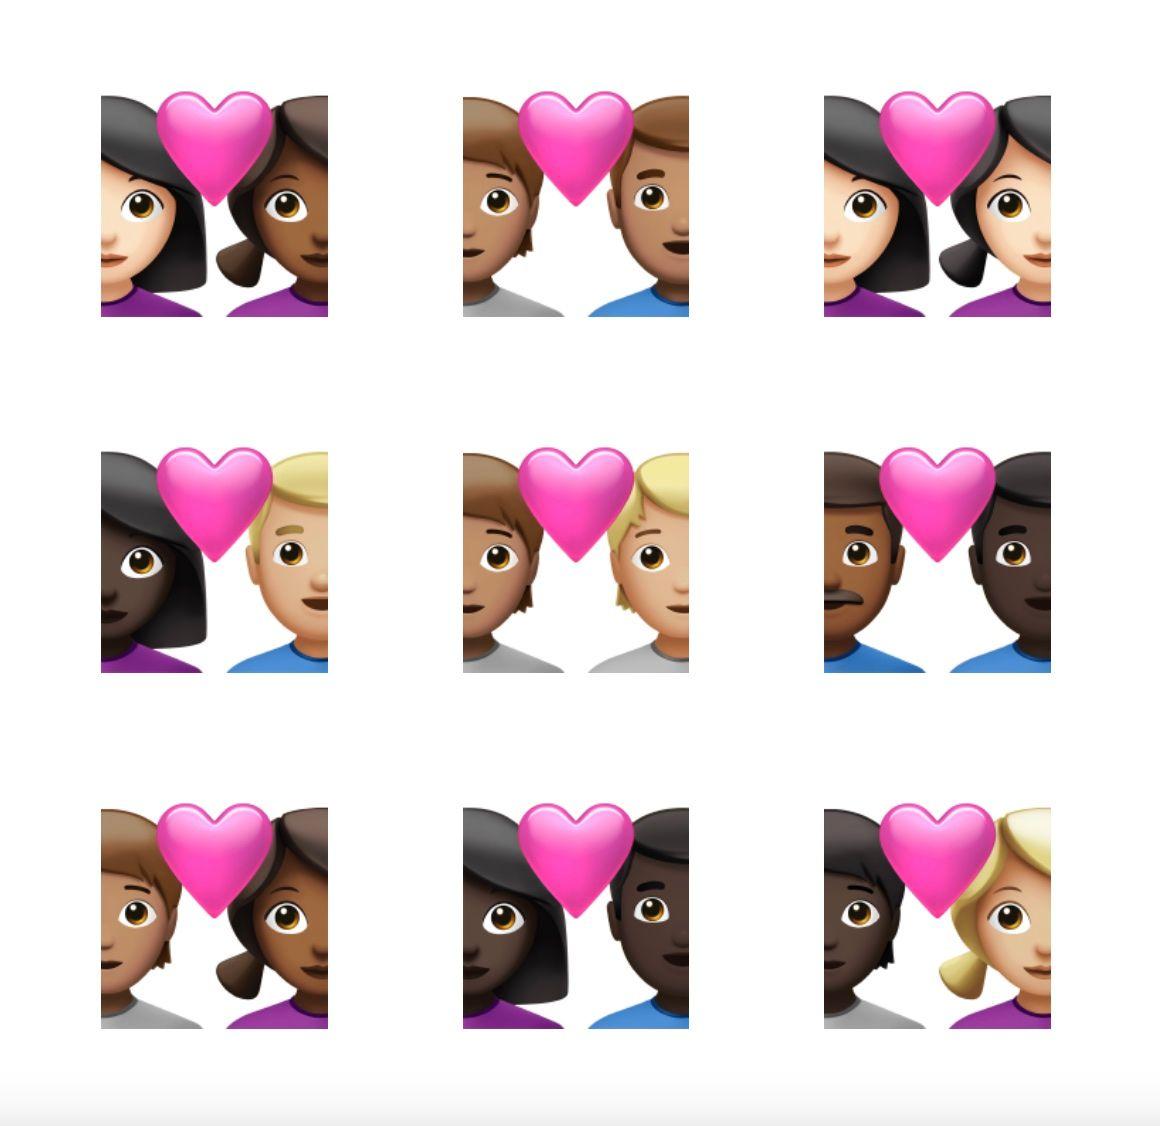 new-couple-options-ios-14-5-emojipedia